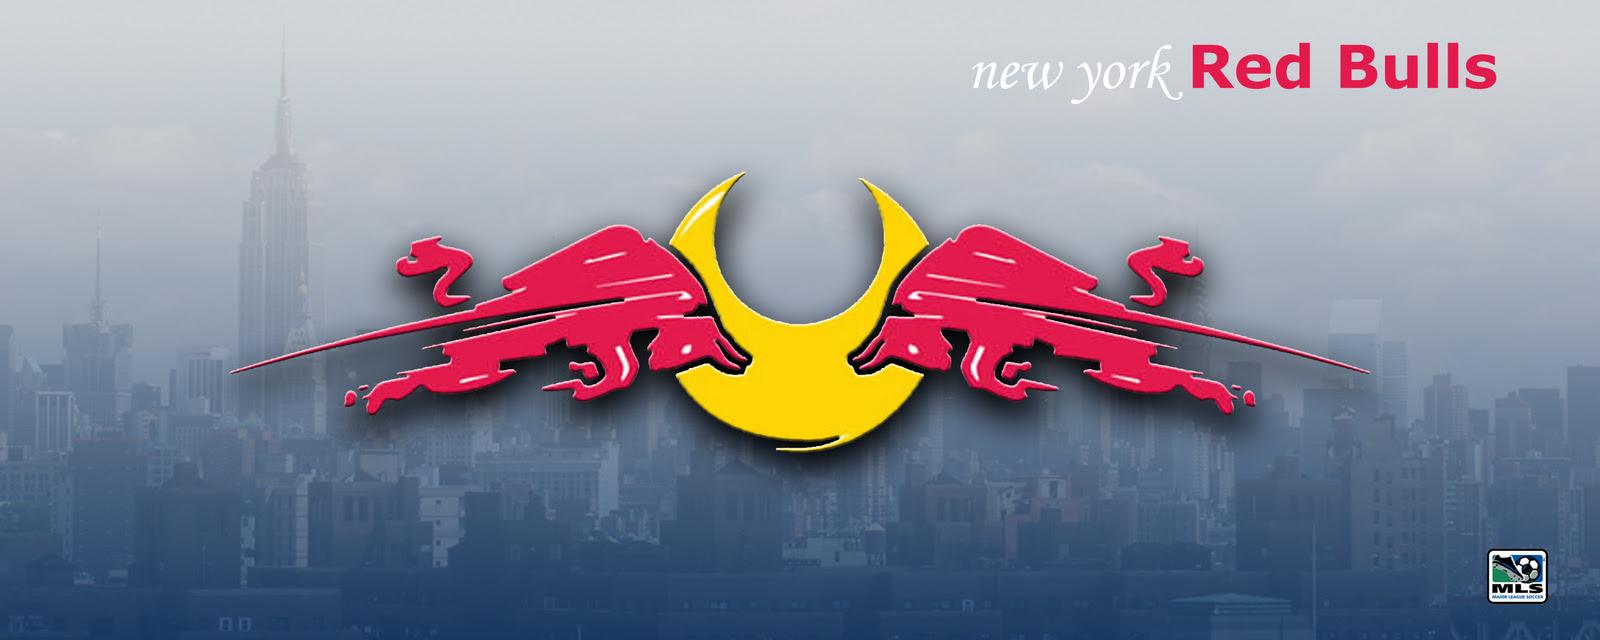 New York Red Bulls Football Wallpaper